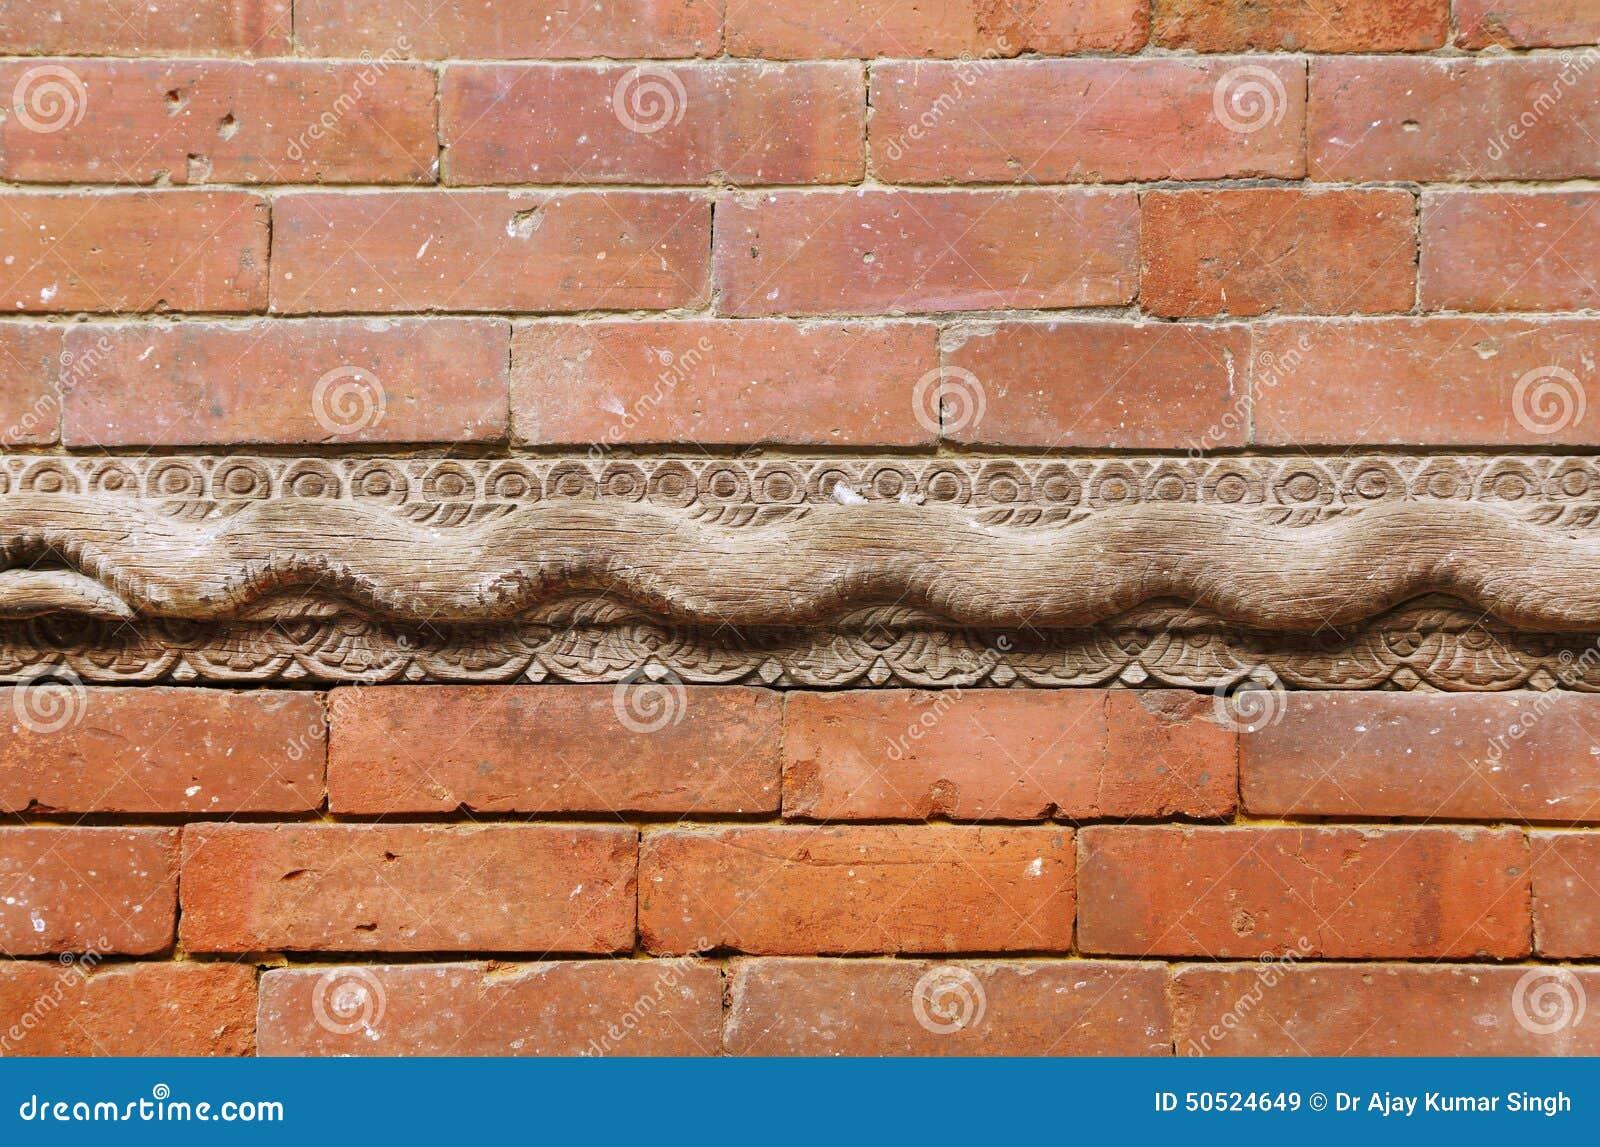 Nepal hanuman dhoka map check out nepal hanuman dhoka map for Wooden work on wall